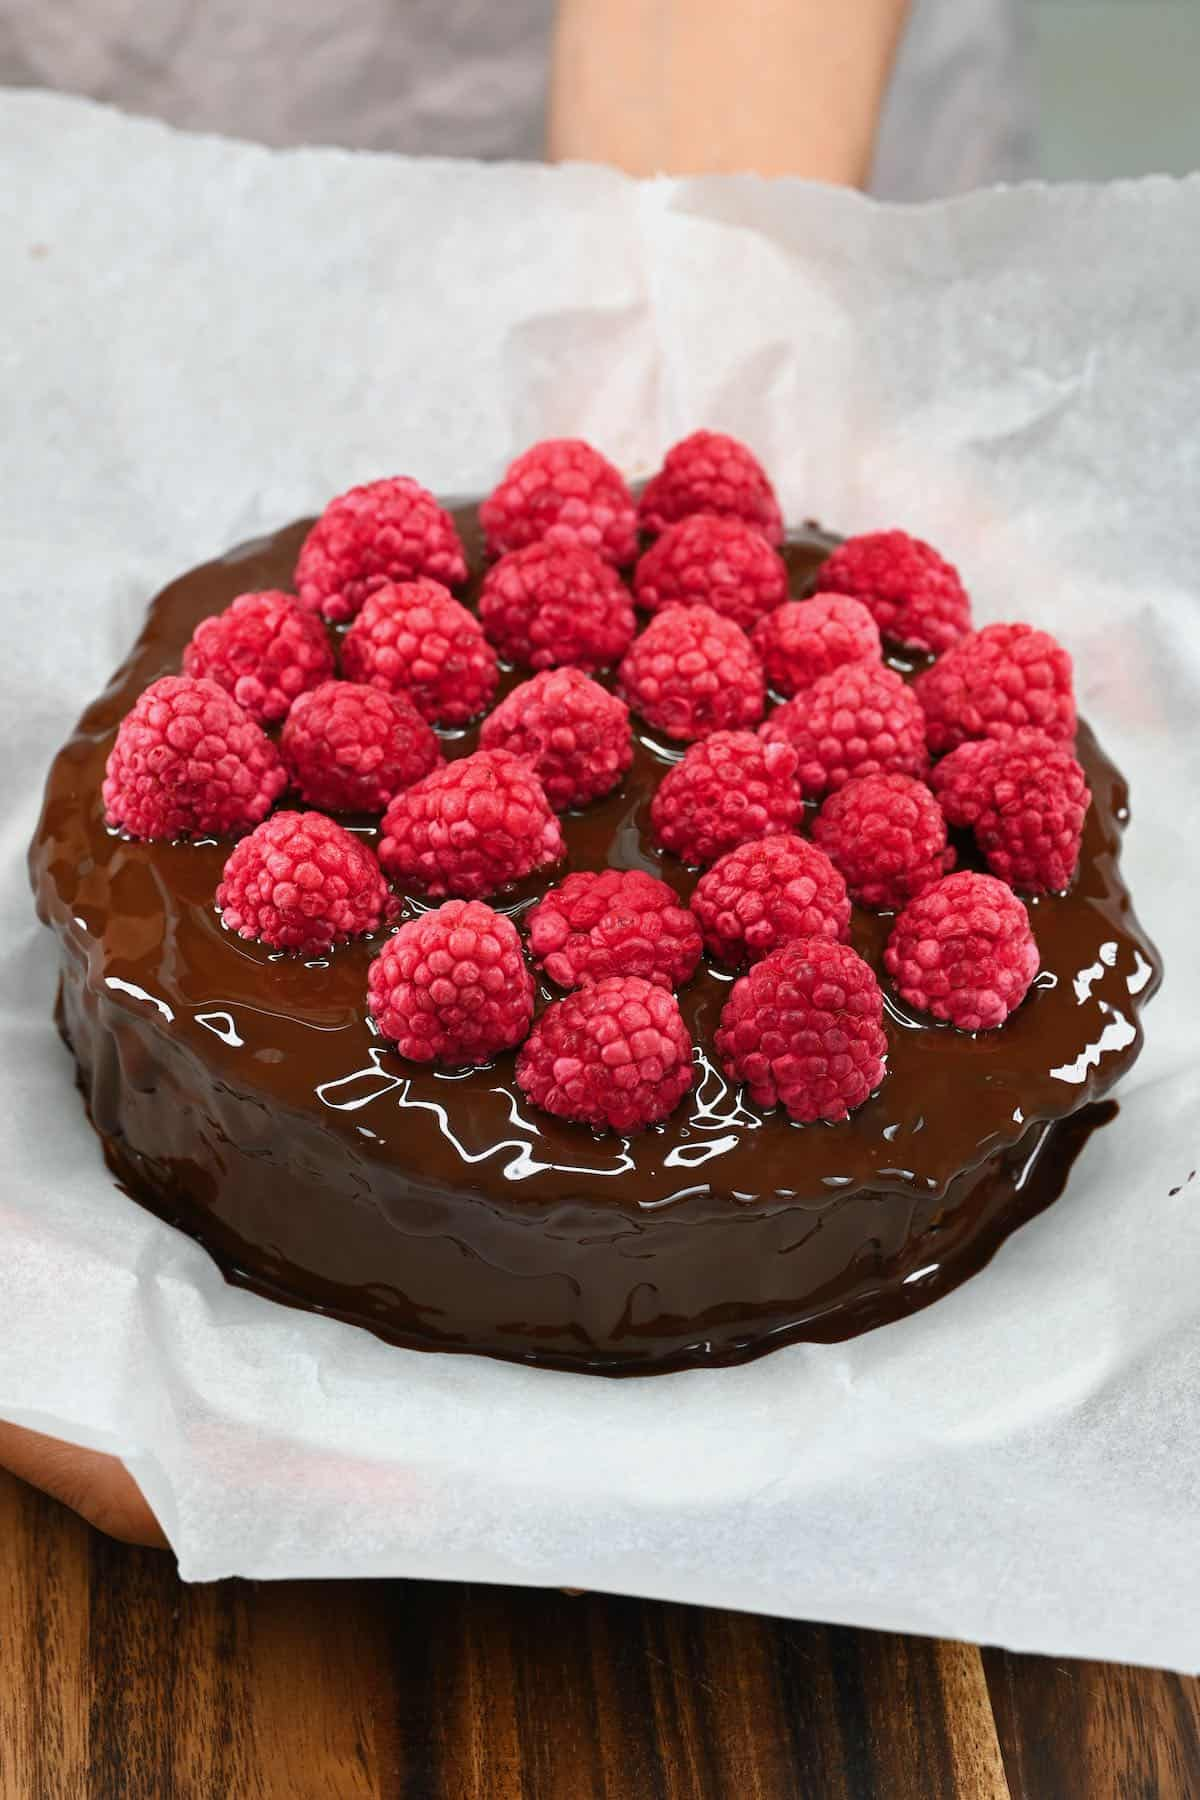 Mars cake with raspberry and chocolate coating